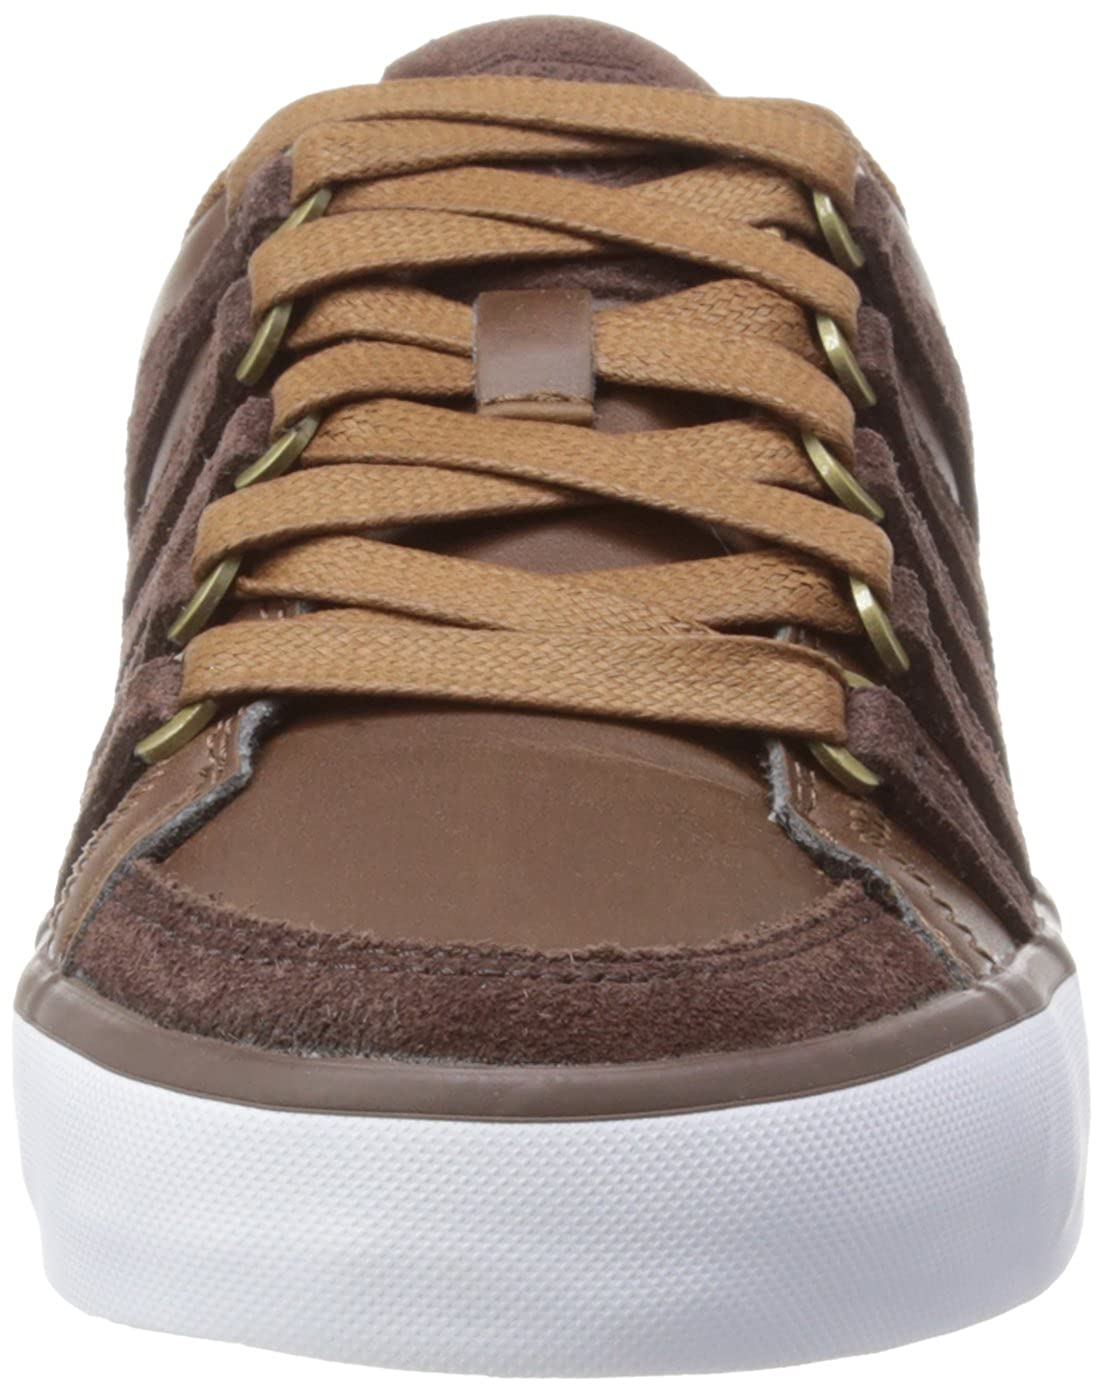 K-Swiss Gowmet II VNZ Kids leather lifestyle sneaker brown